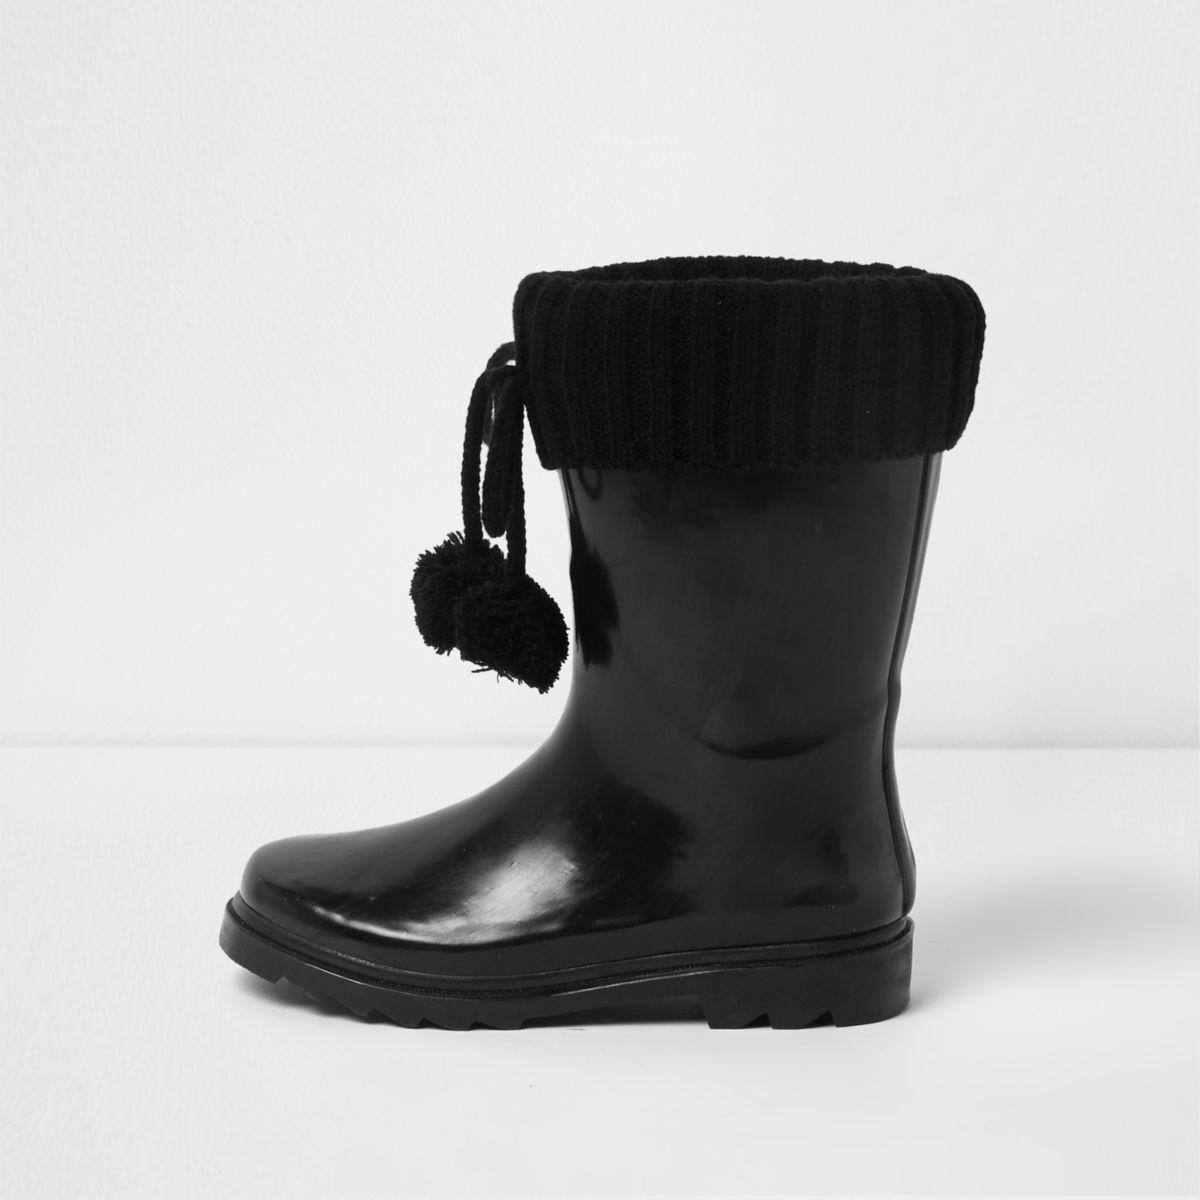 Girls black knit foldover pom pom rubber boots